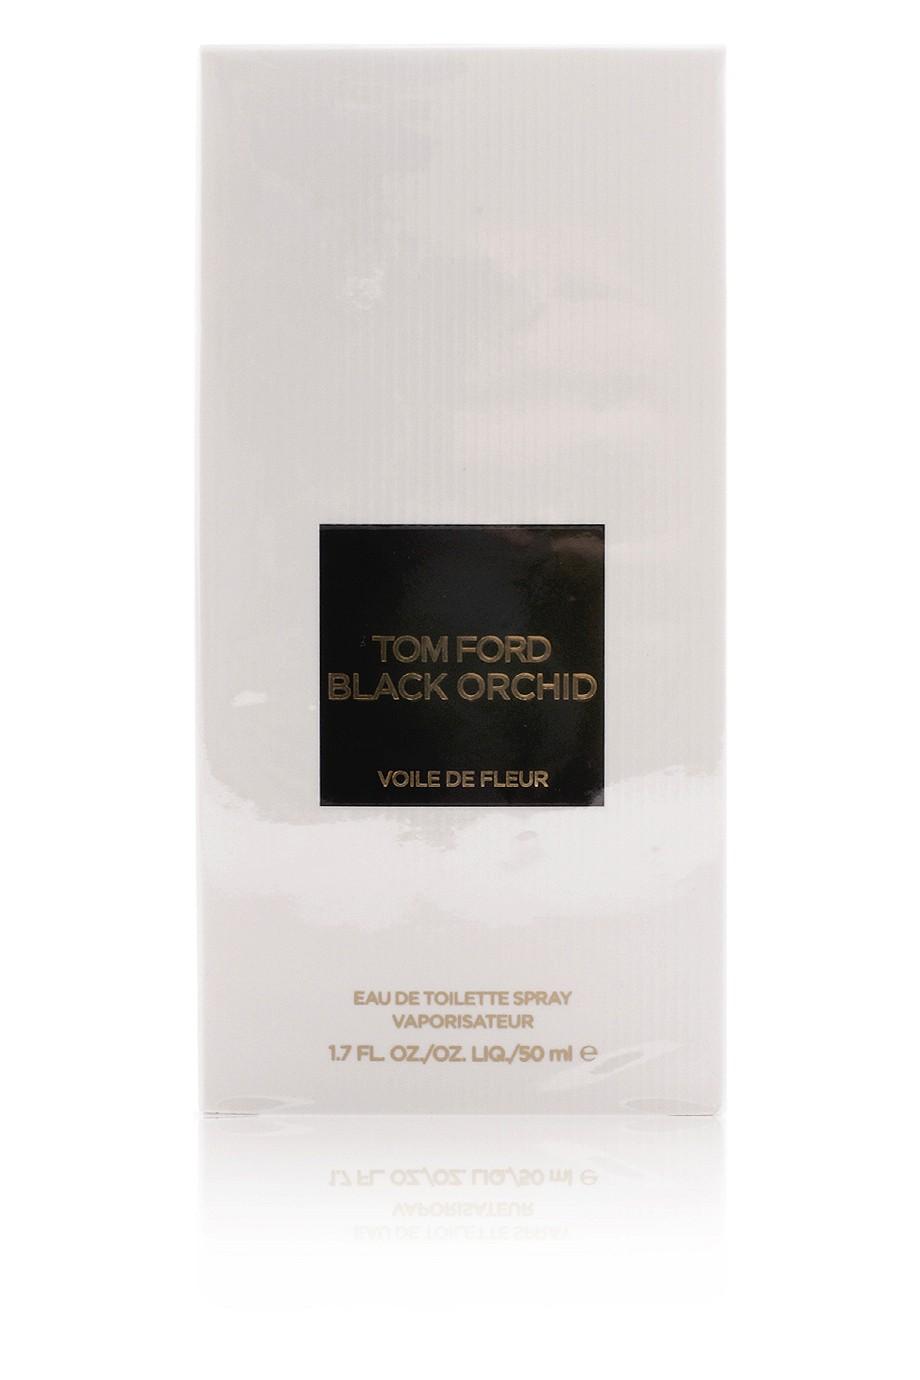 Tom Ford Black Orchid Voile De Fleur аромат для женщин